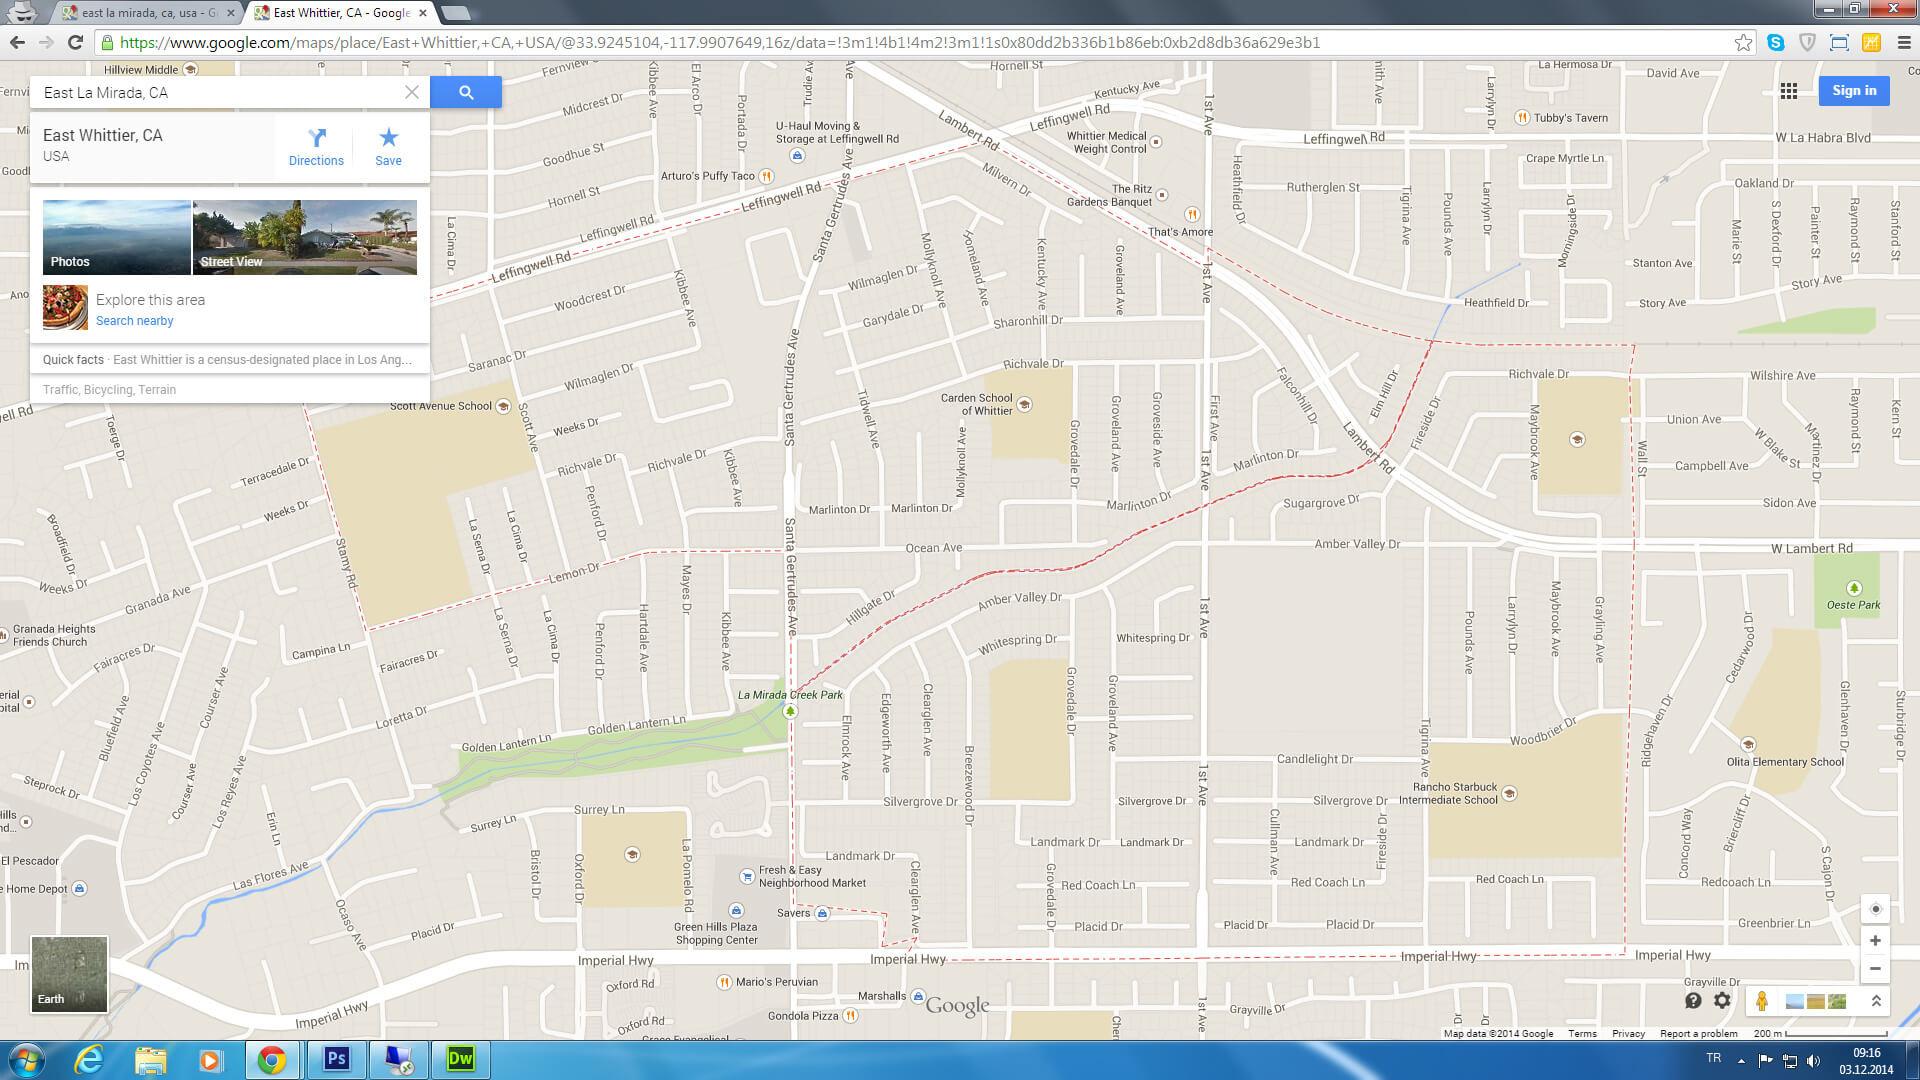 Redondo Beach Google Map Printable Maps East La Mirada California - Redondo Beach California Map